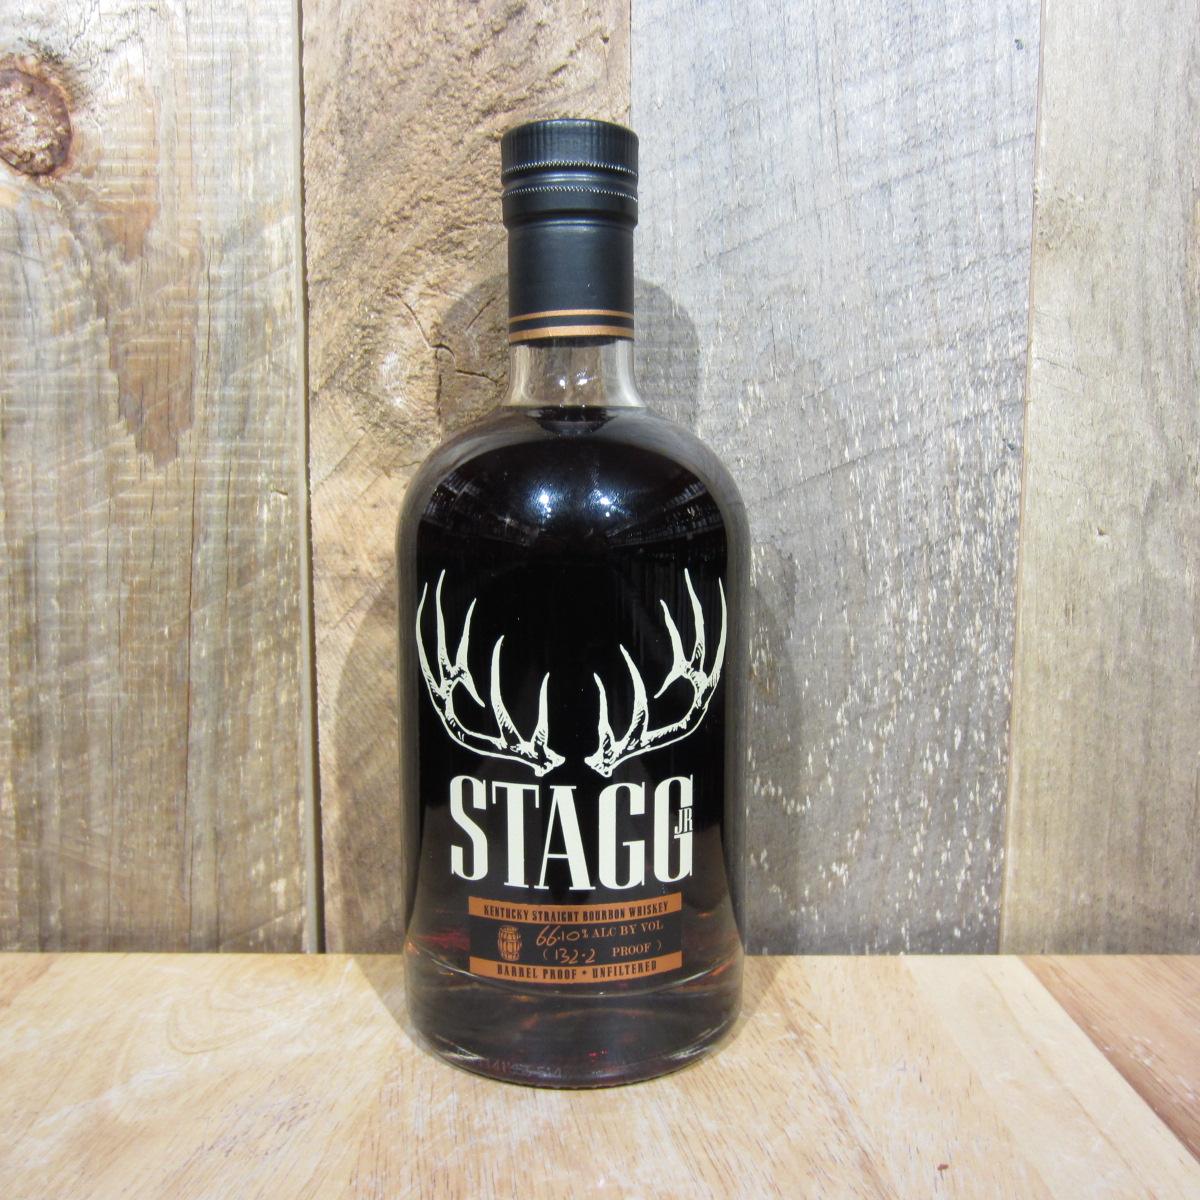 Stagg Jr Bourbon 132.2 Proof 750ml